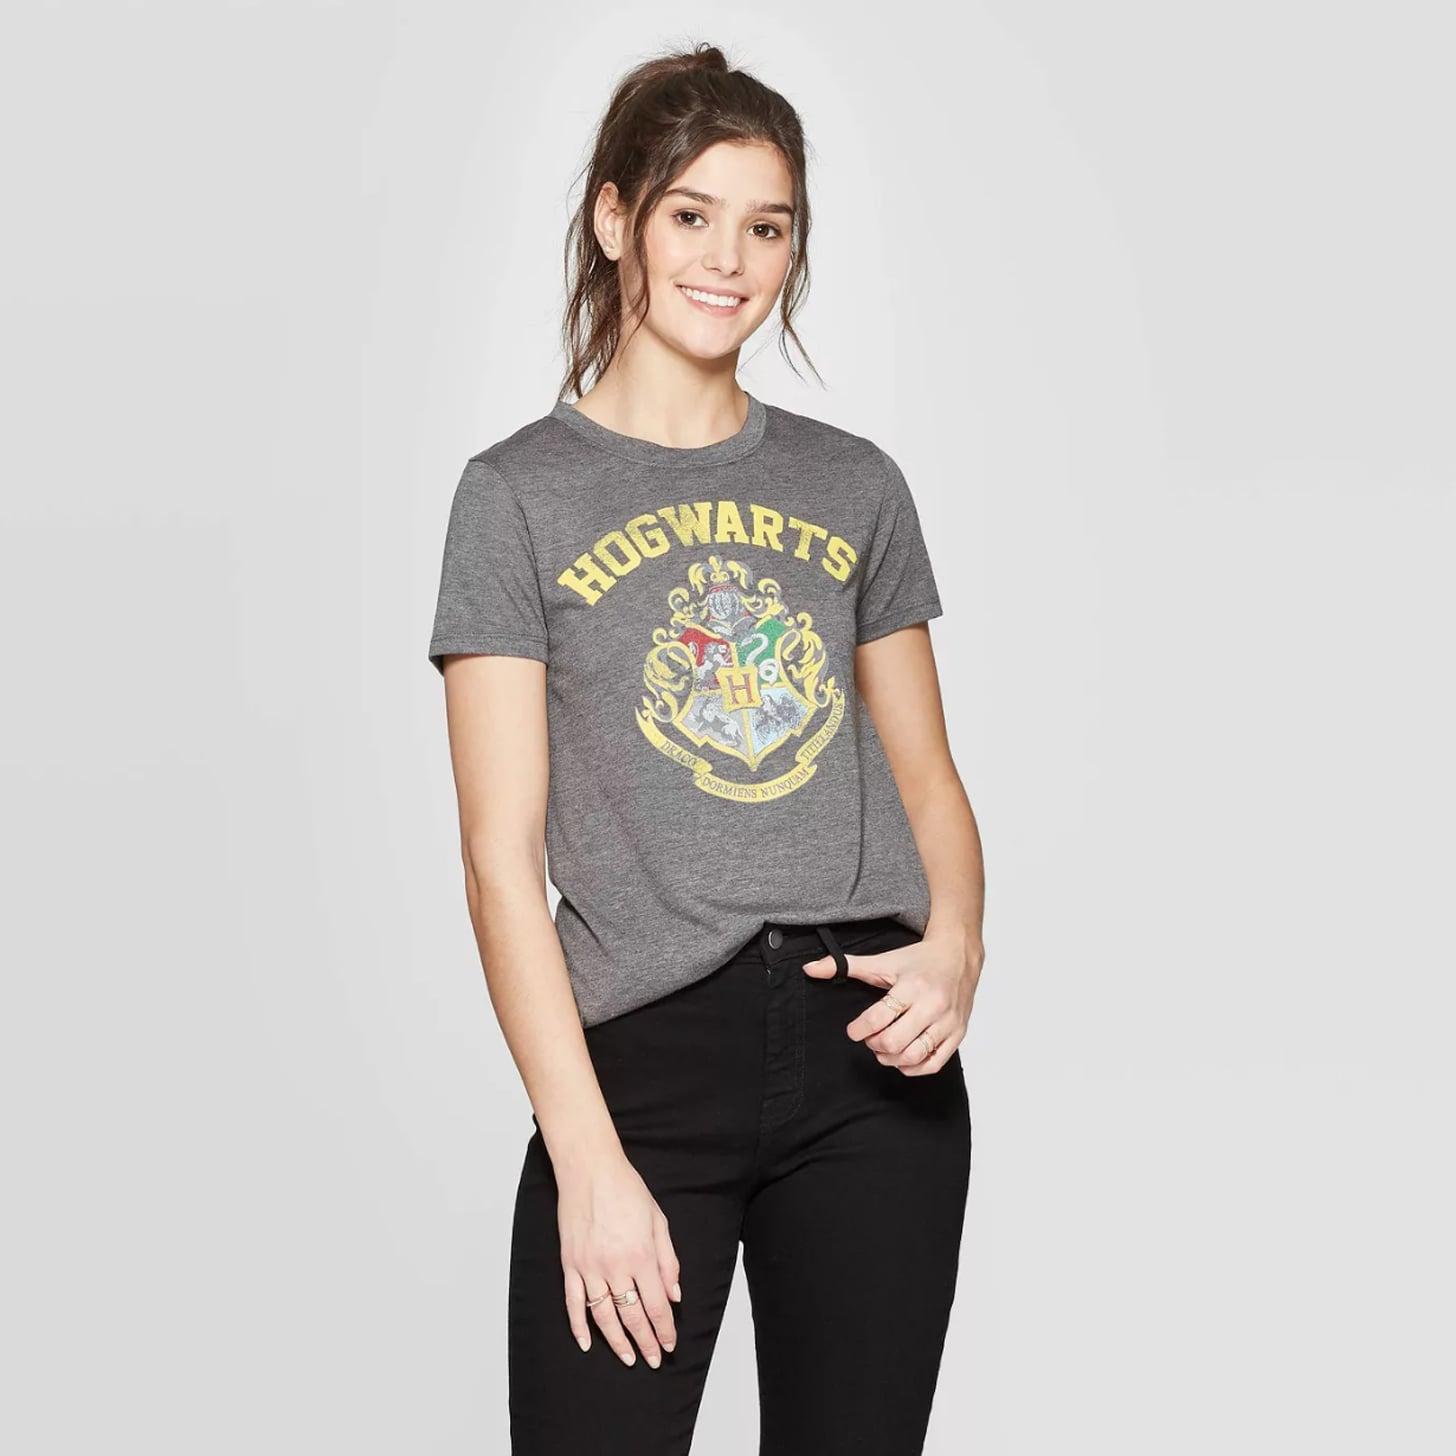 Best Target Harry Potter Merchandise | POPSUGAR Family